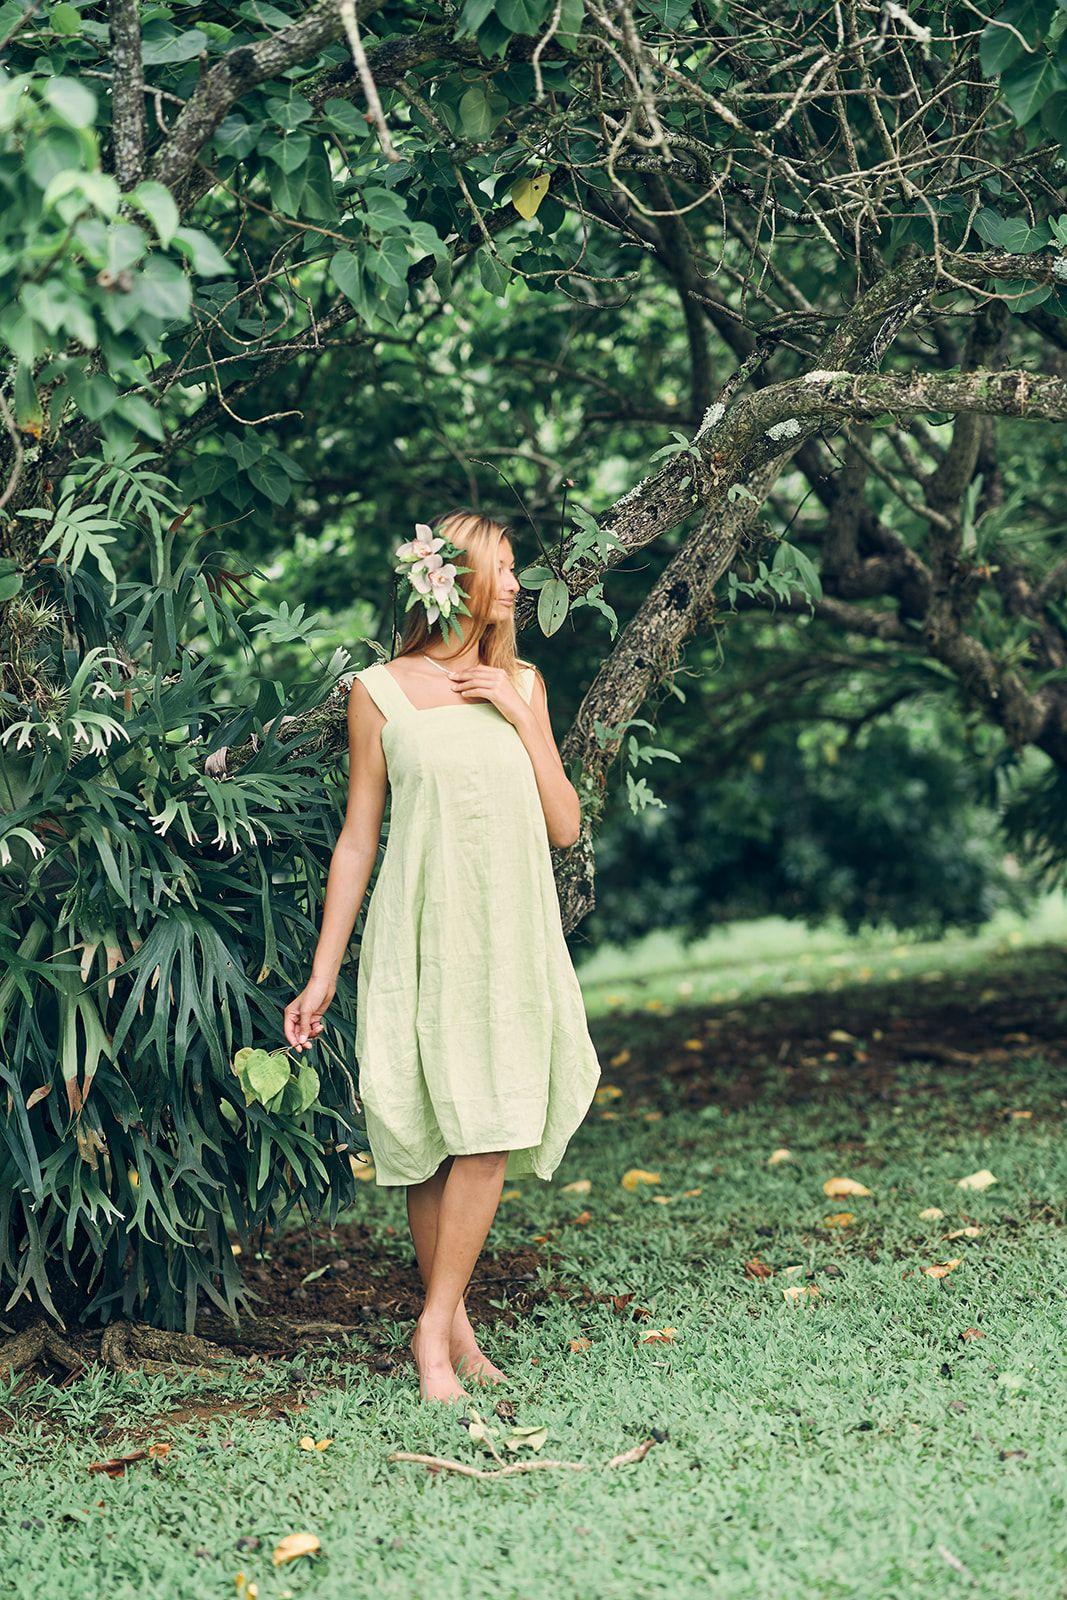 kauai-lifestyle-portrait-photographer-kilauaea-afewgoodclicks 48